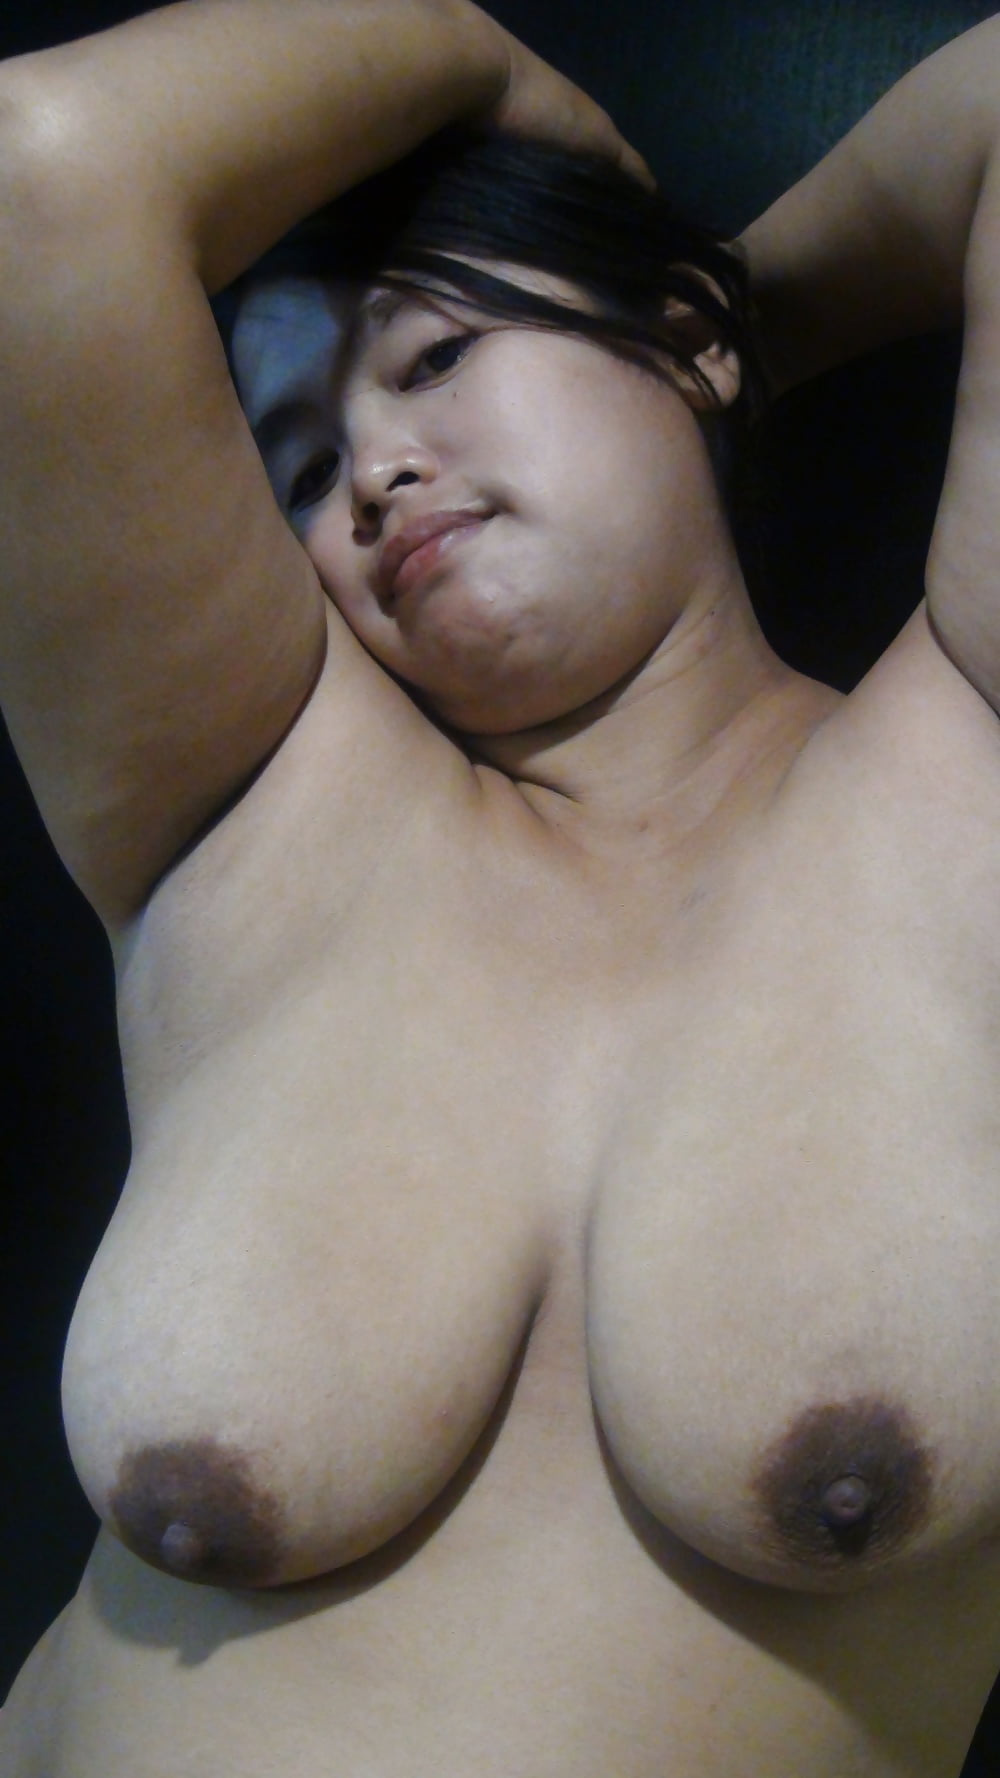 Ball busting bondage sex